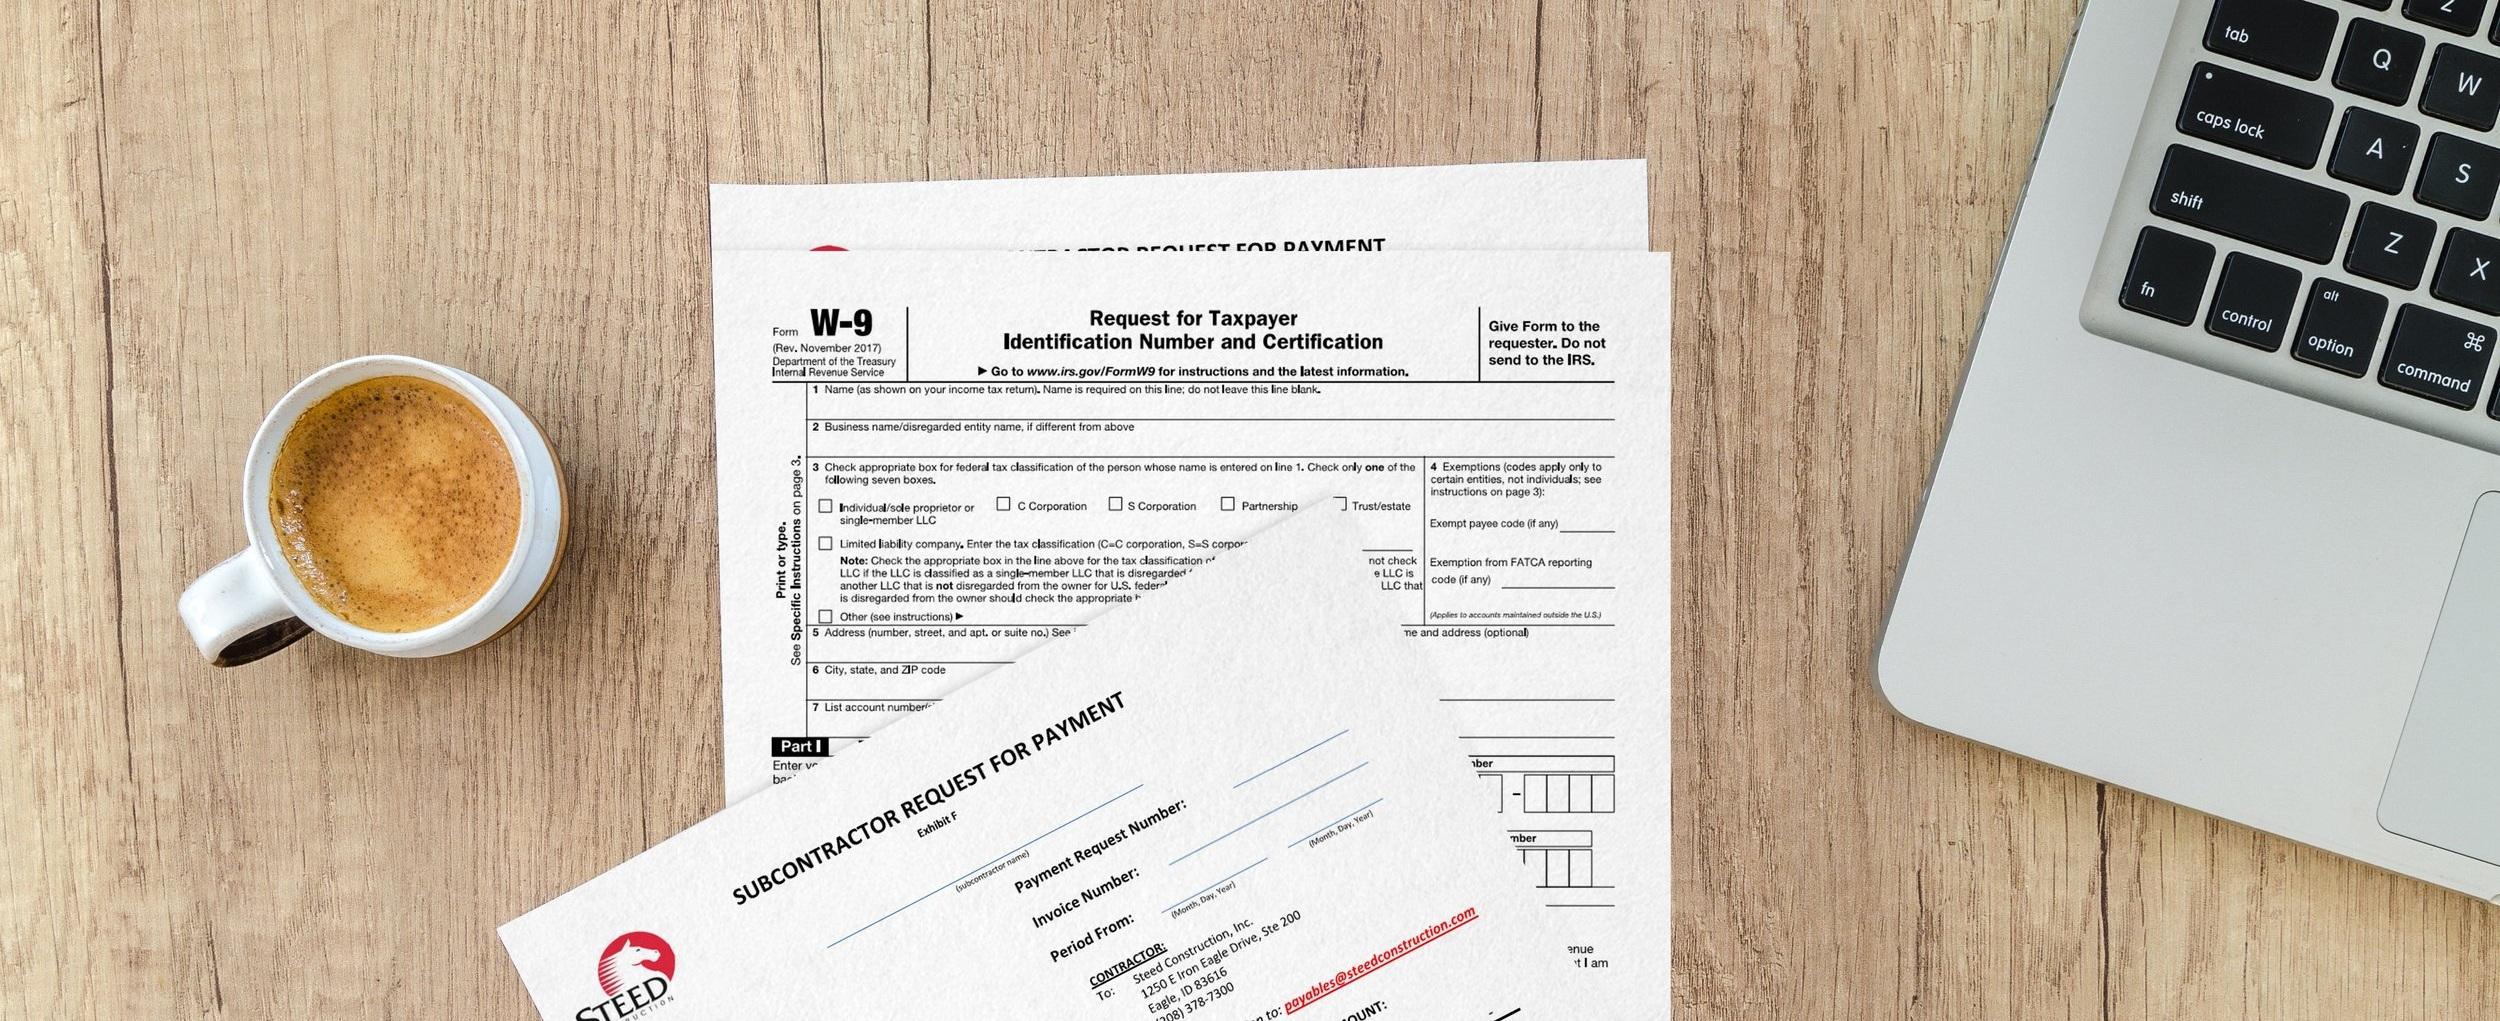 billing & payment -